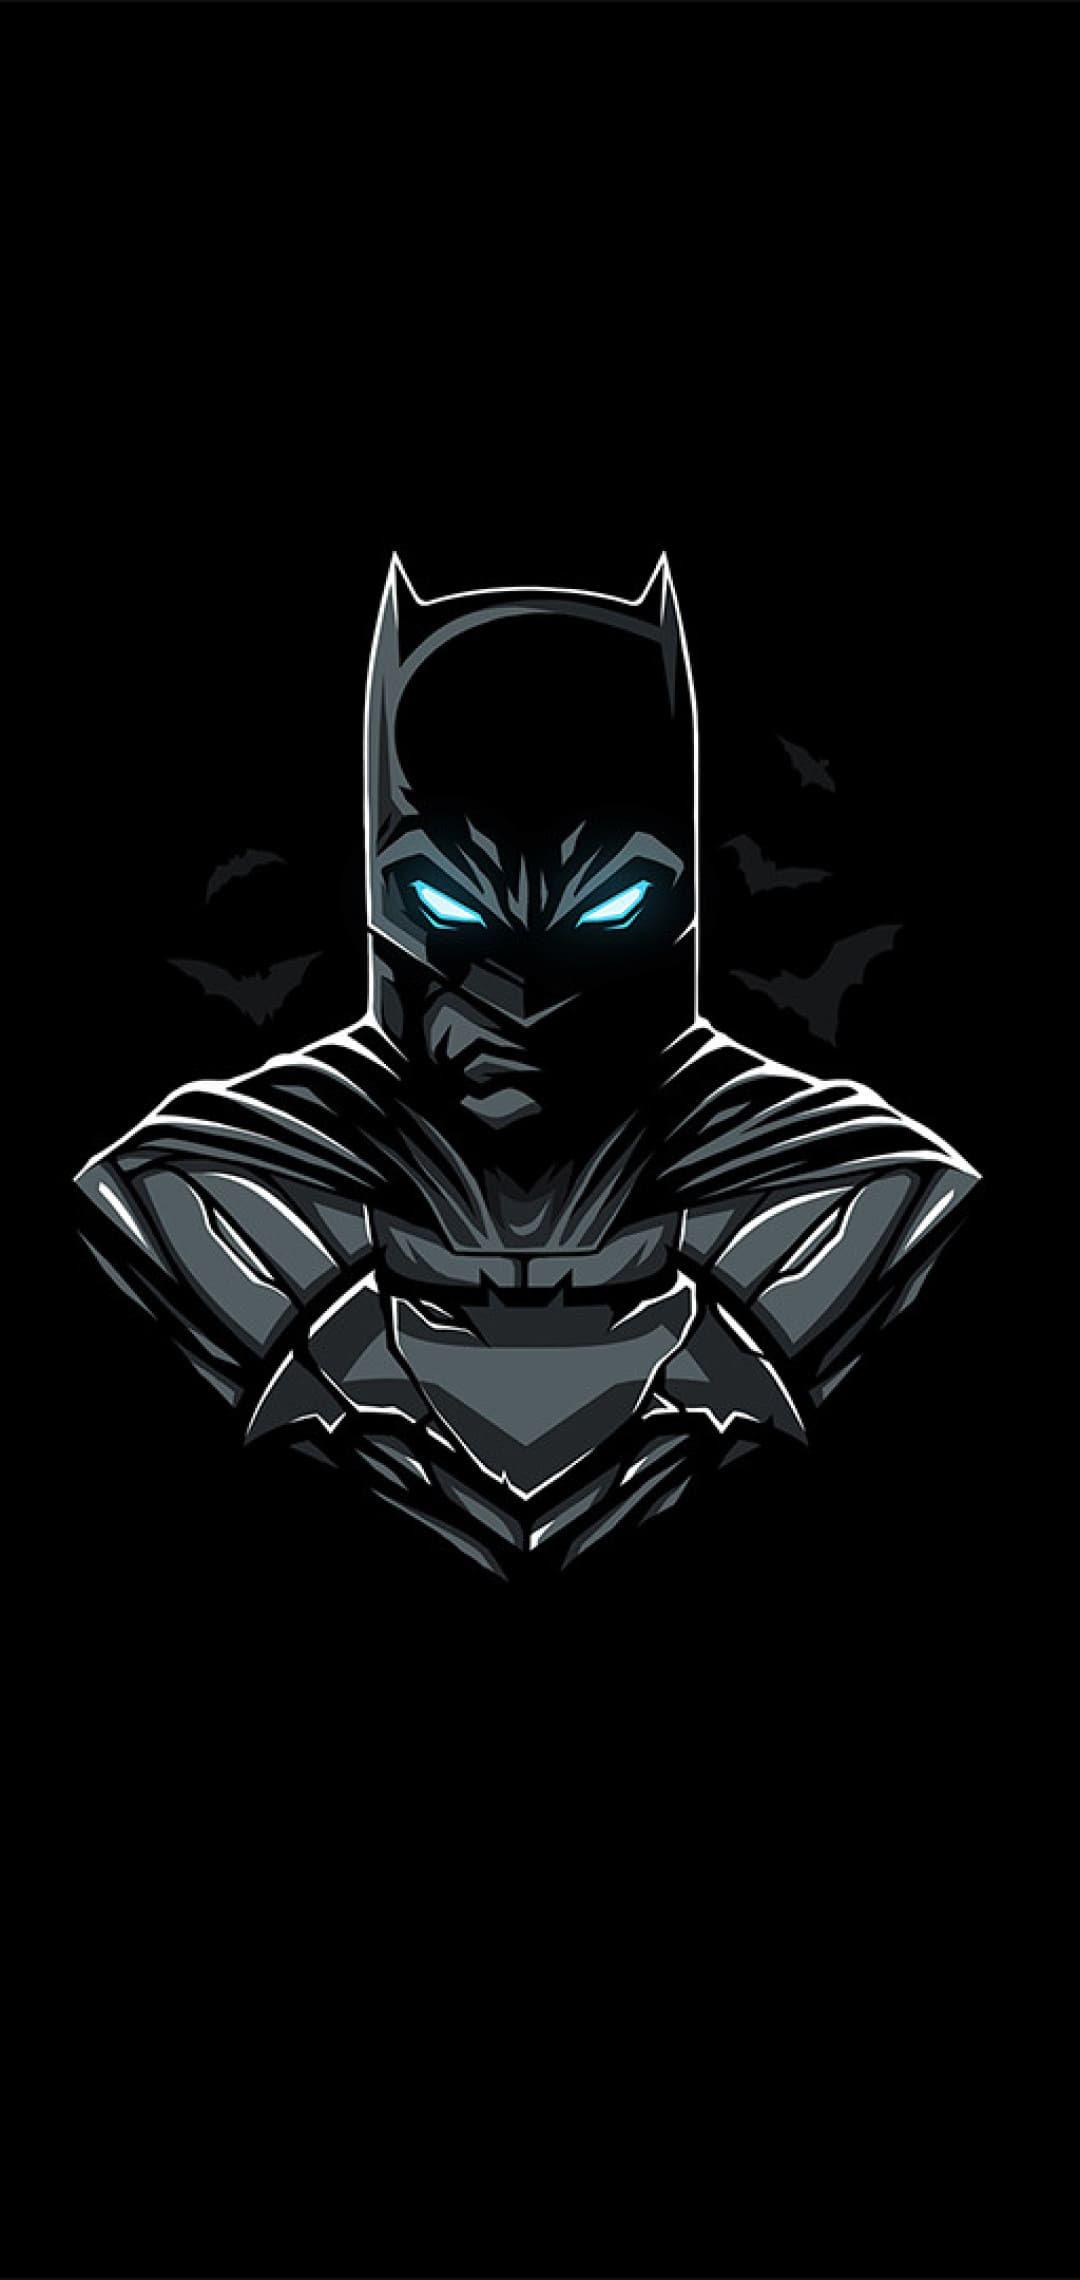 Top 95 Batman Wallpapers Download Free Hd Batman Background Images